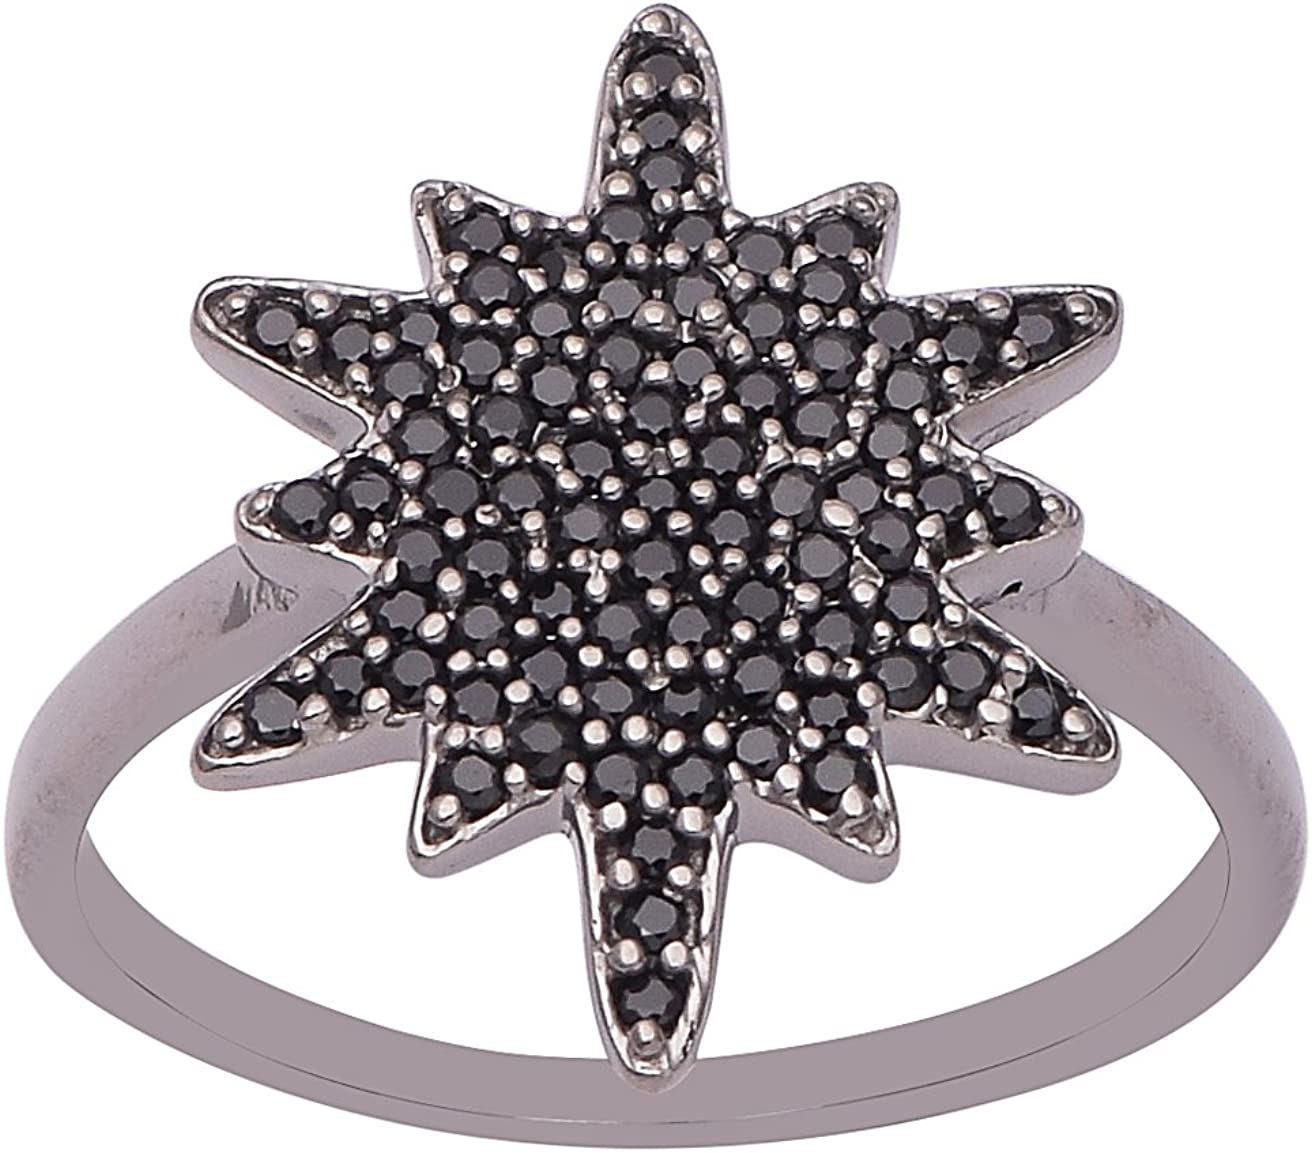 Black Spinel Gemstone 925 Sterling Silver Ring SHRI-3013 Comic Galaxy Ring